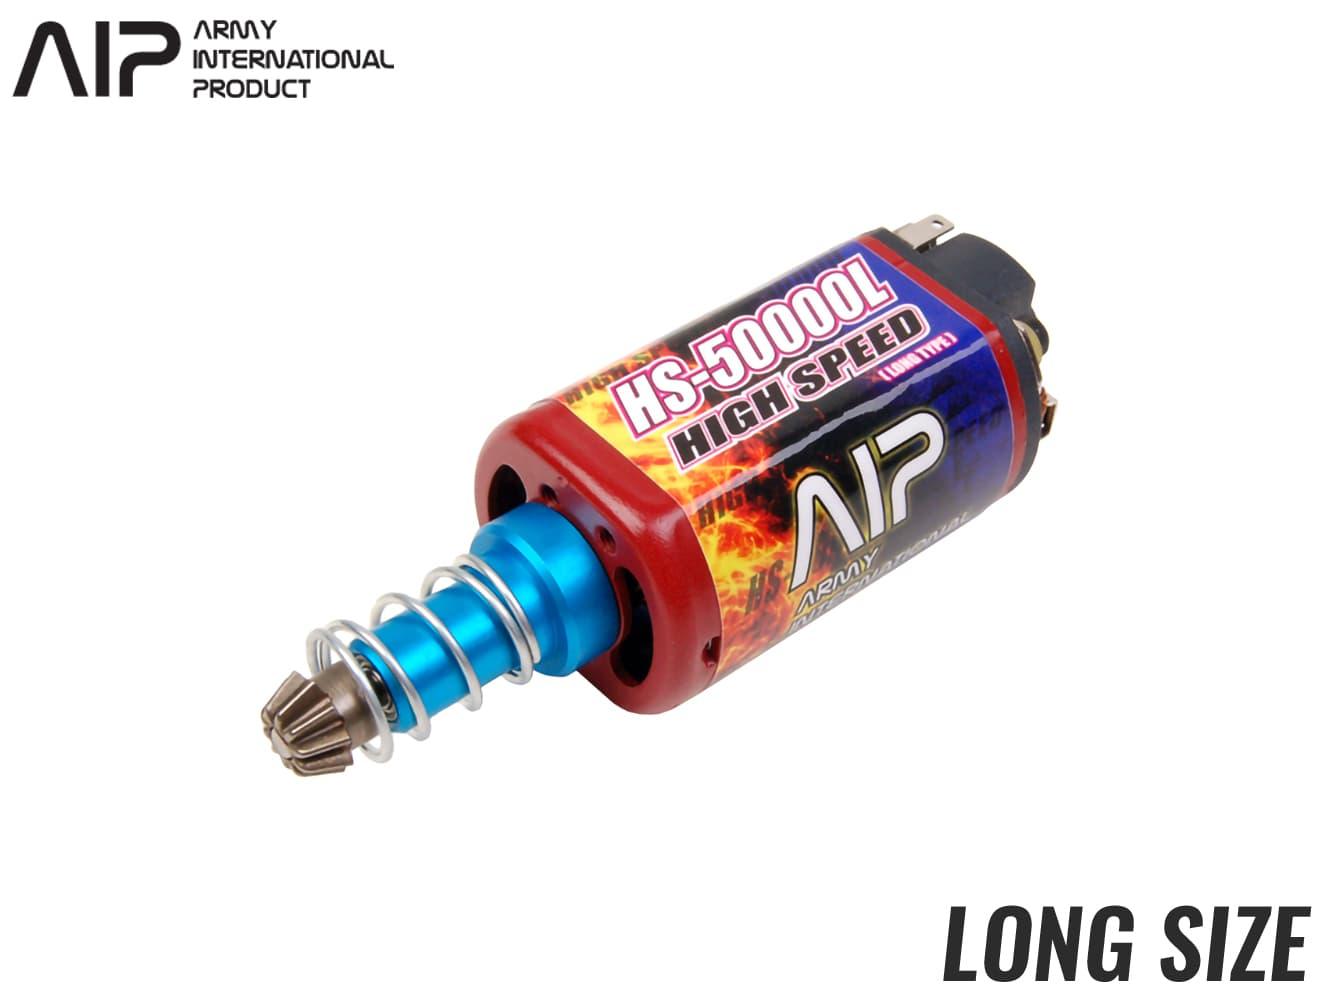 AIP ハイスピードモーター HS-50000 ロングサイズ◆各社電動ガン ロングサイズモーター機種に適合 理論回転数50000RPM 超ハイサイ仕様に